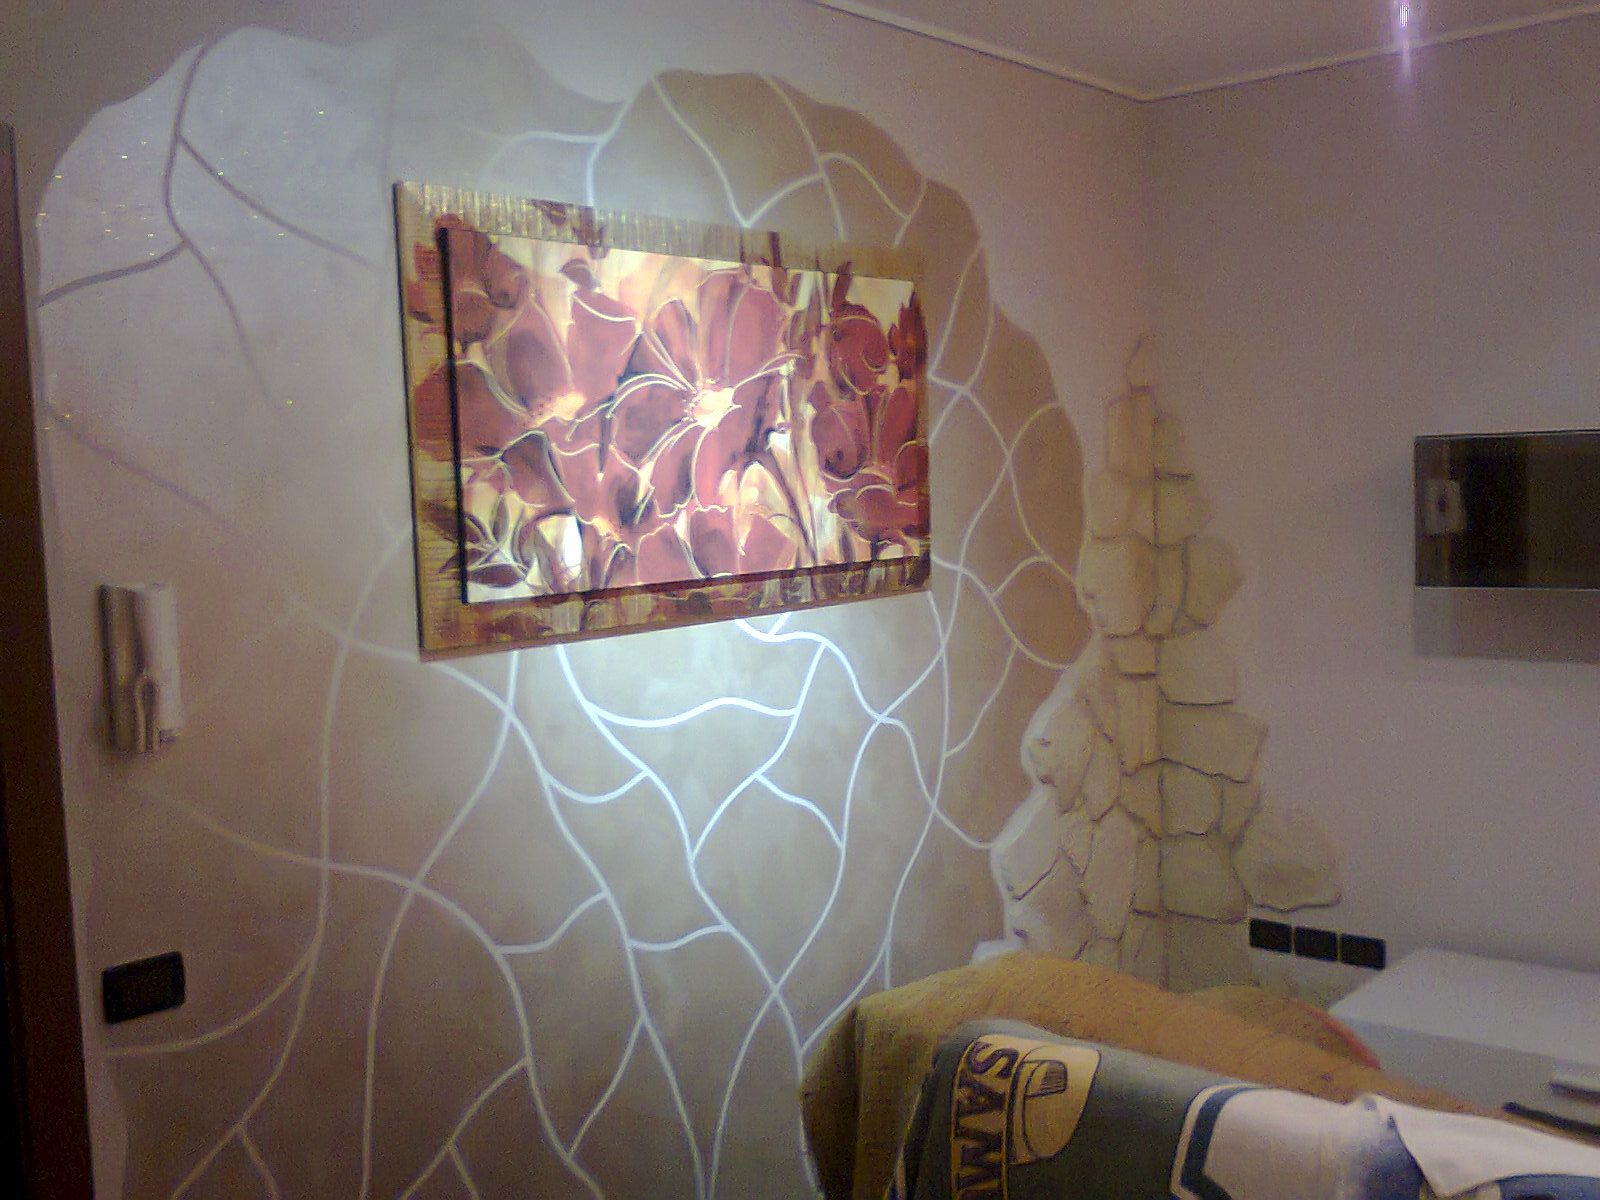 pittura decorativa riflessi opere - Casaplast